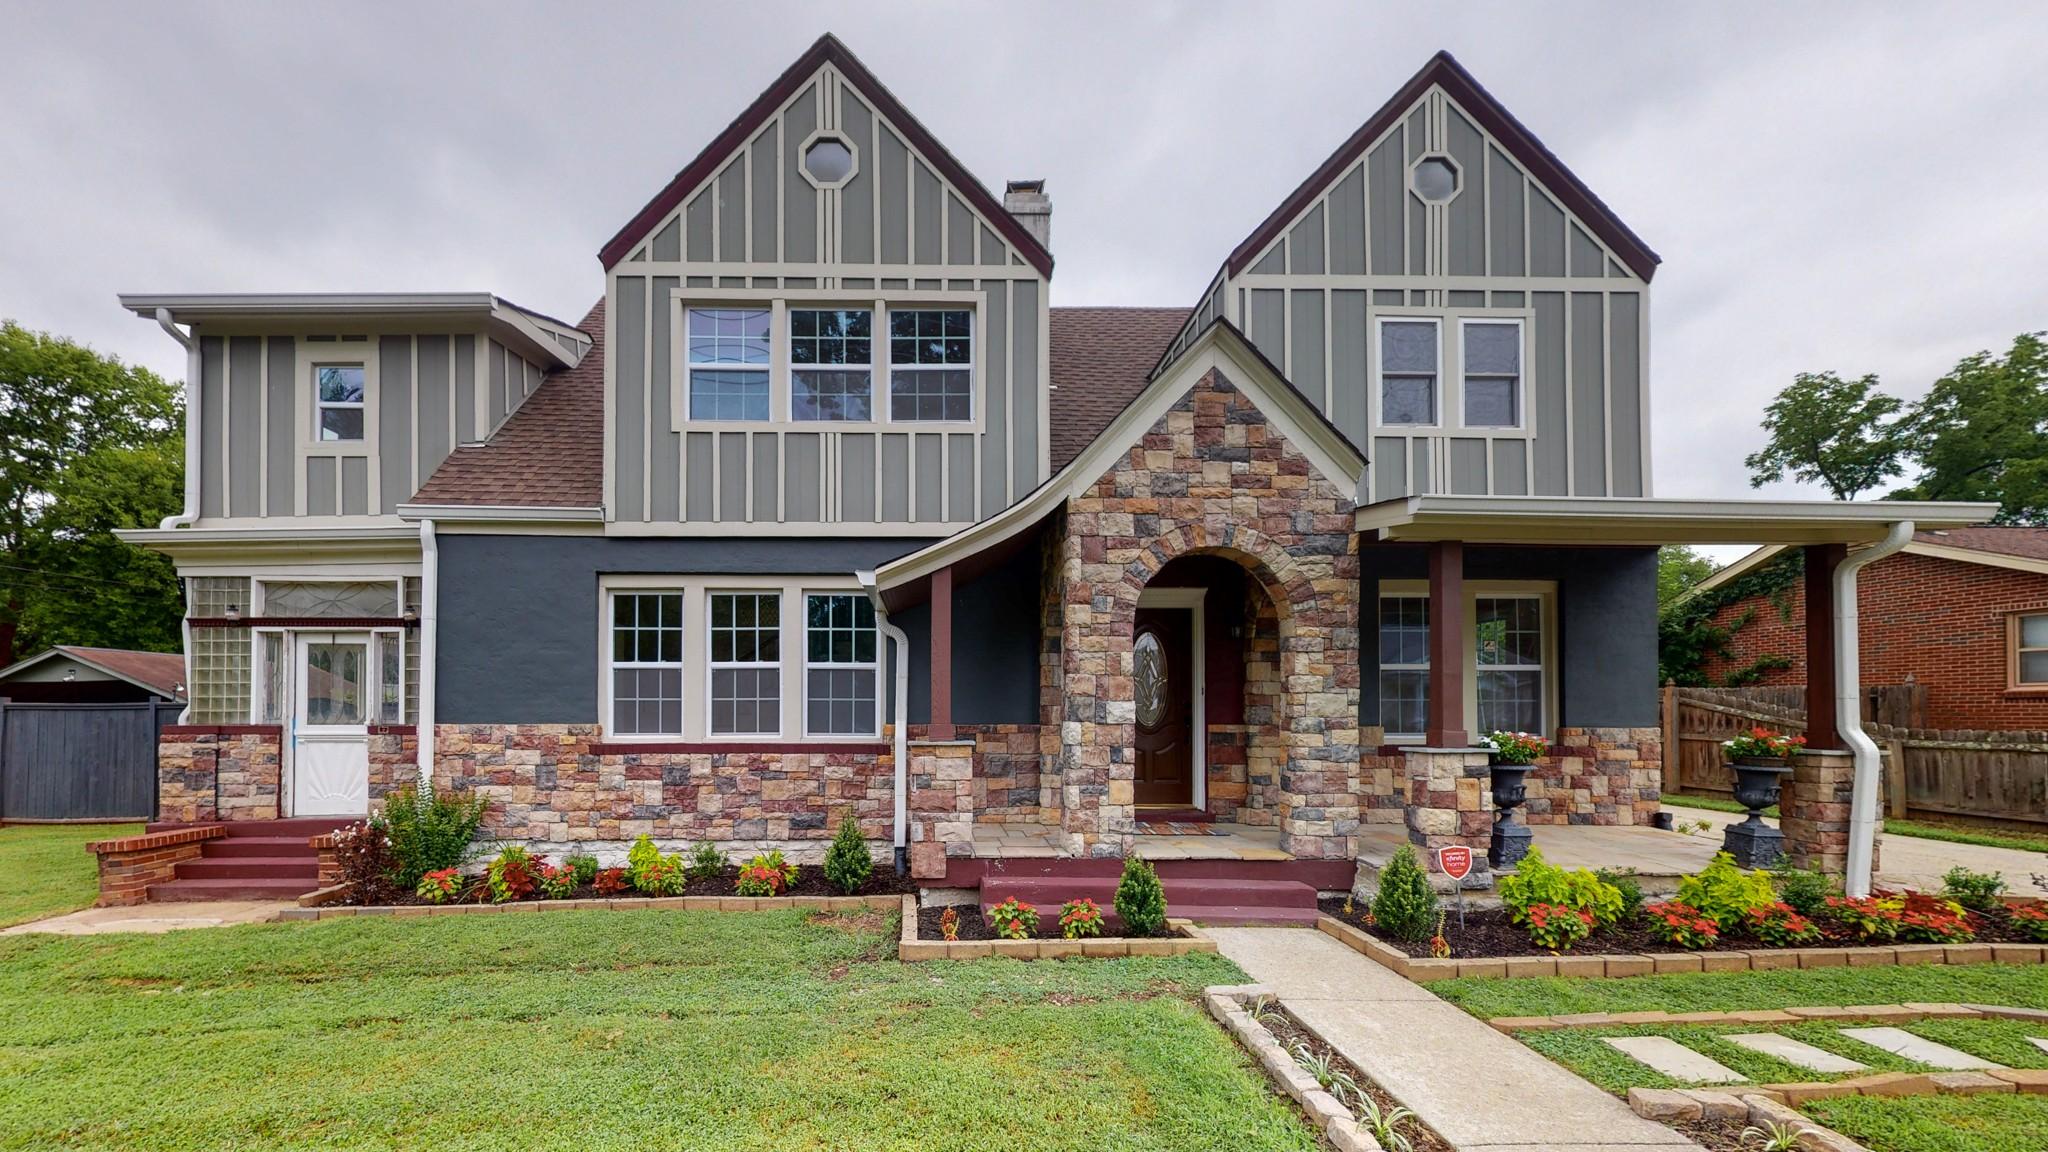 3821 Baxter Ave Property Photo - Nashville, TN real estate listing